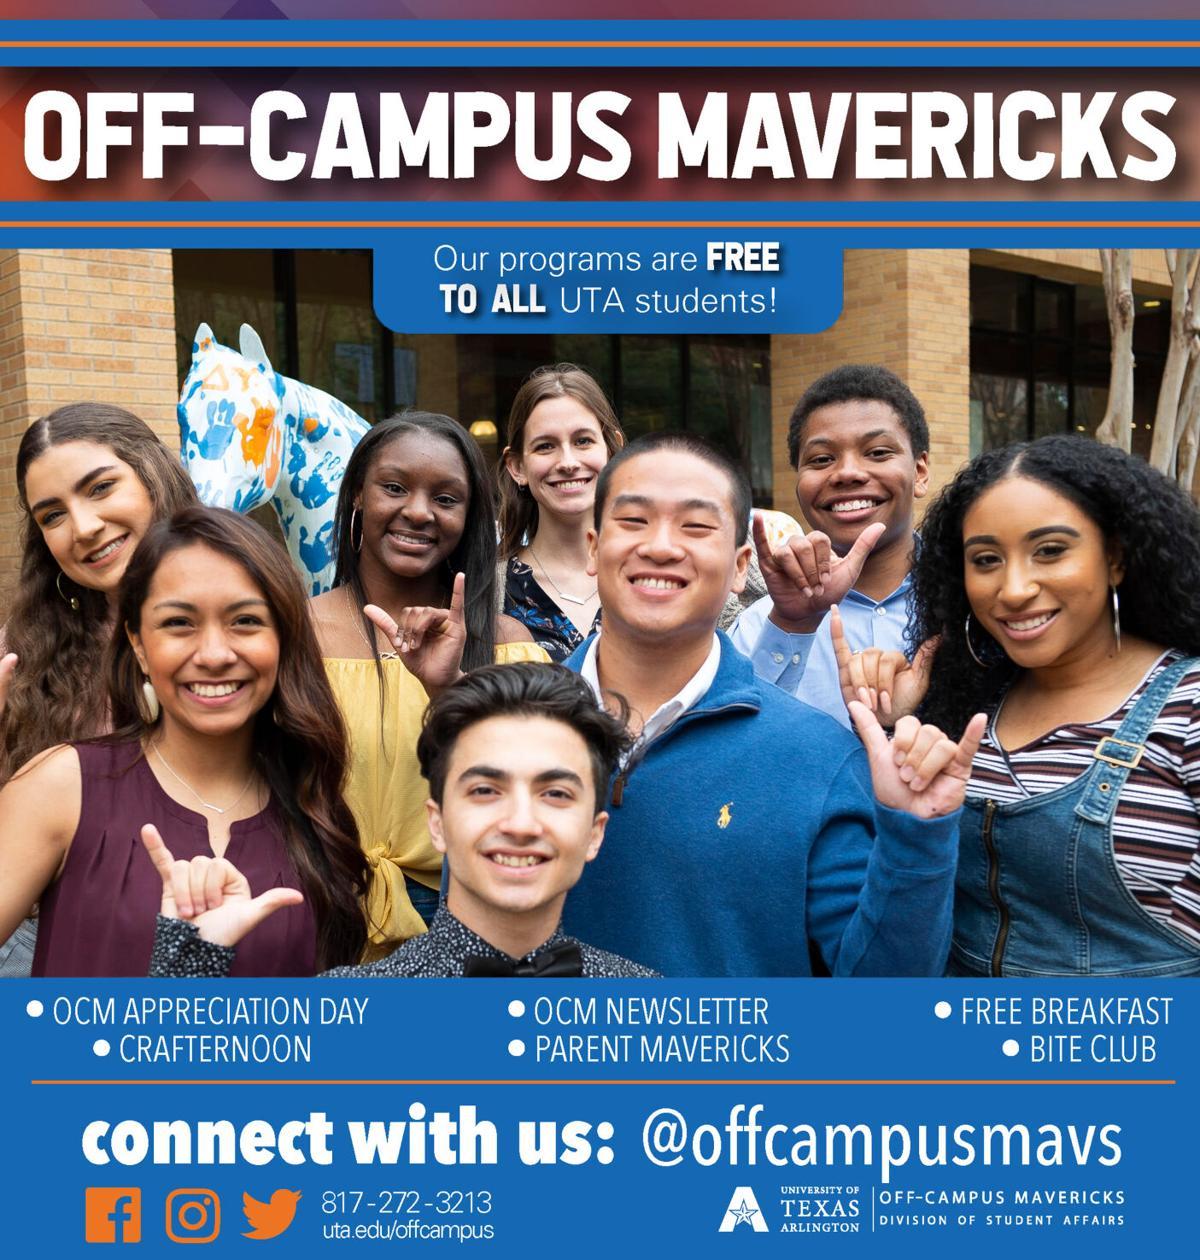 UTA Off-Campus Mavericks